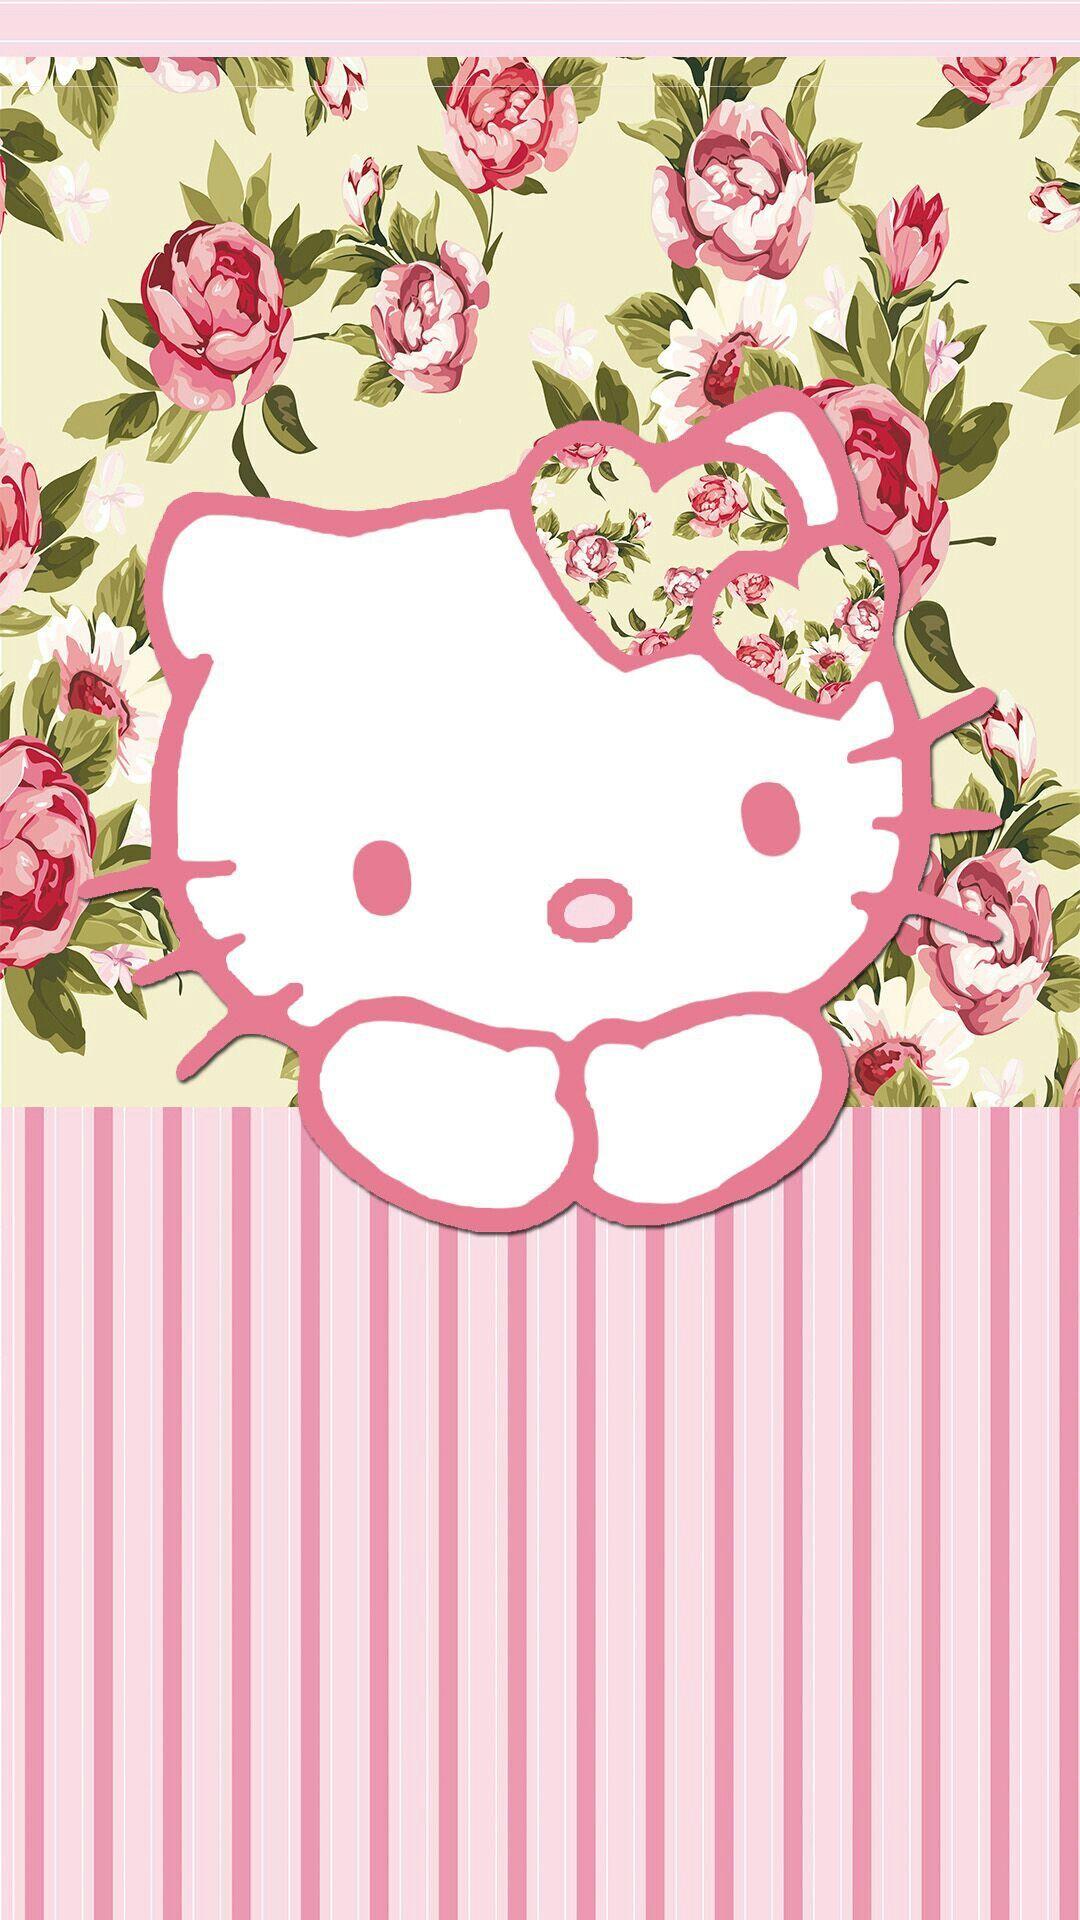 Wonderful Wallpaper Hello Kitty Floral - 371fd05bd8215f5d953b491e6ae96c9d  Image_78924.jpg